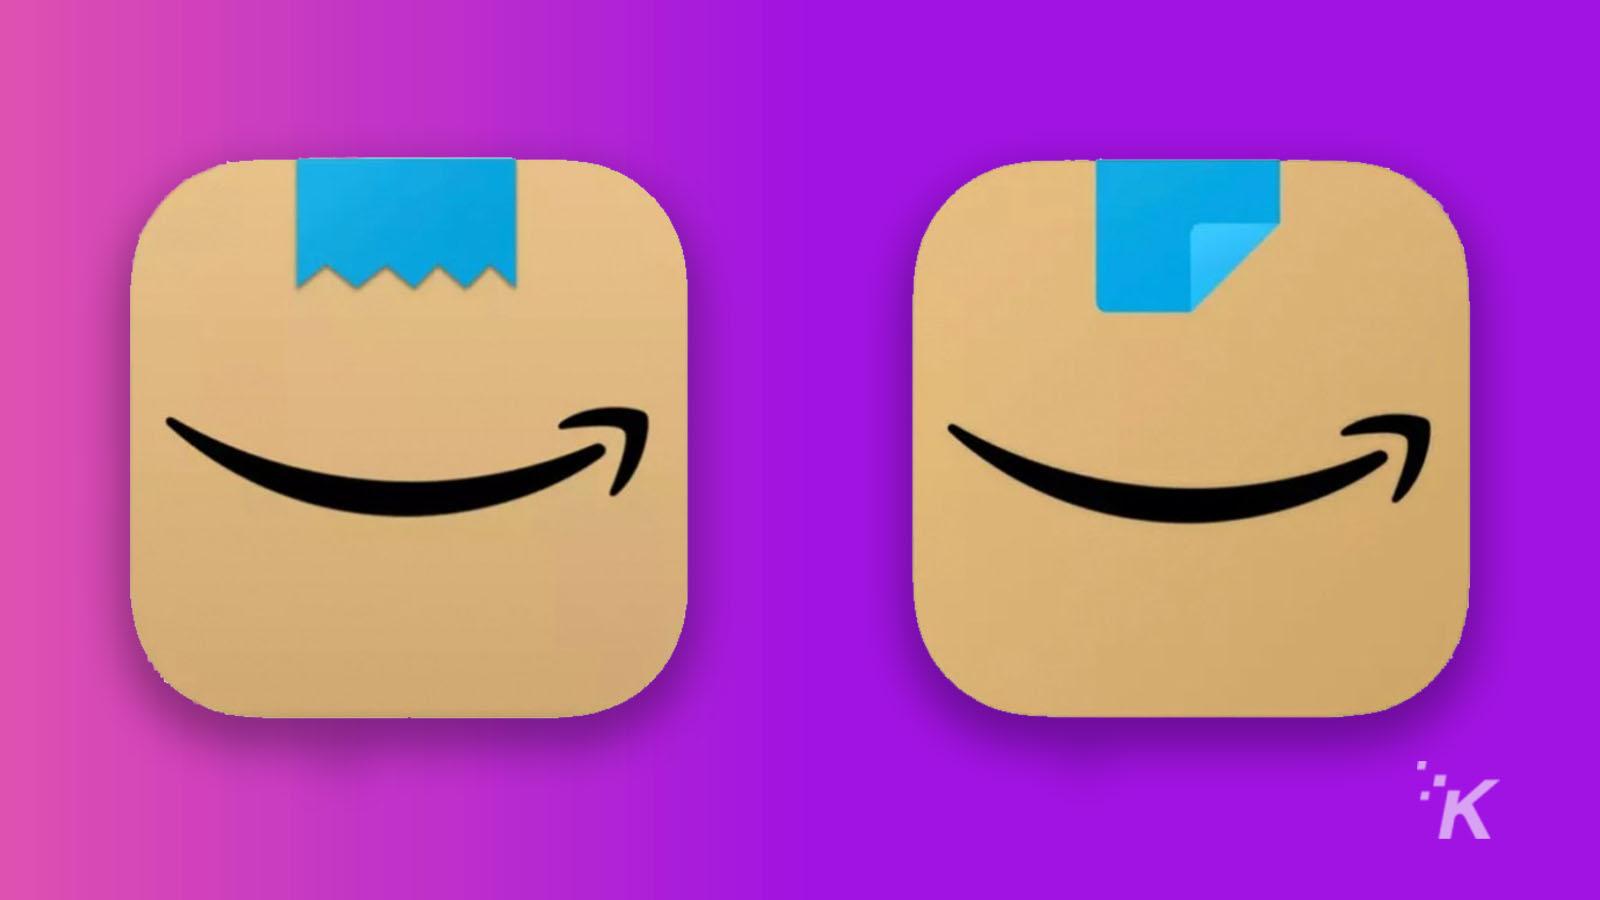 amazon logo refreshed to not look like hitler